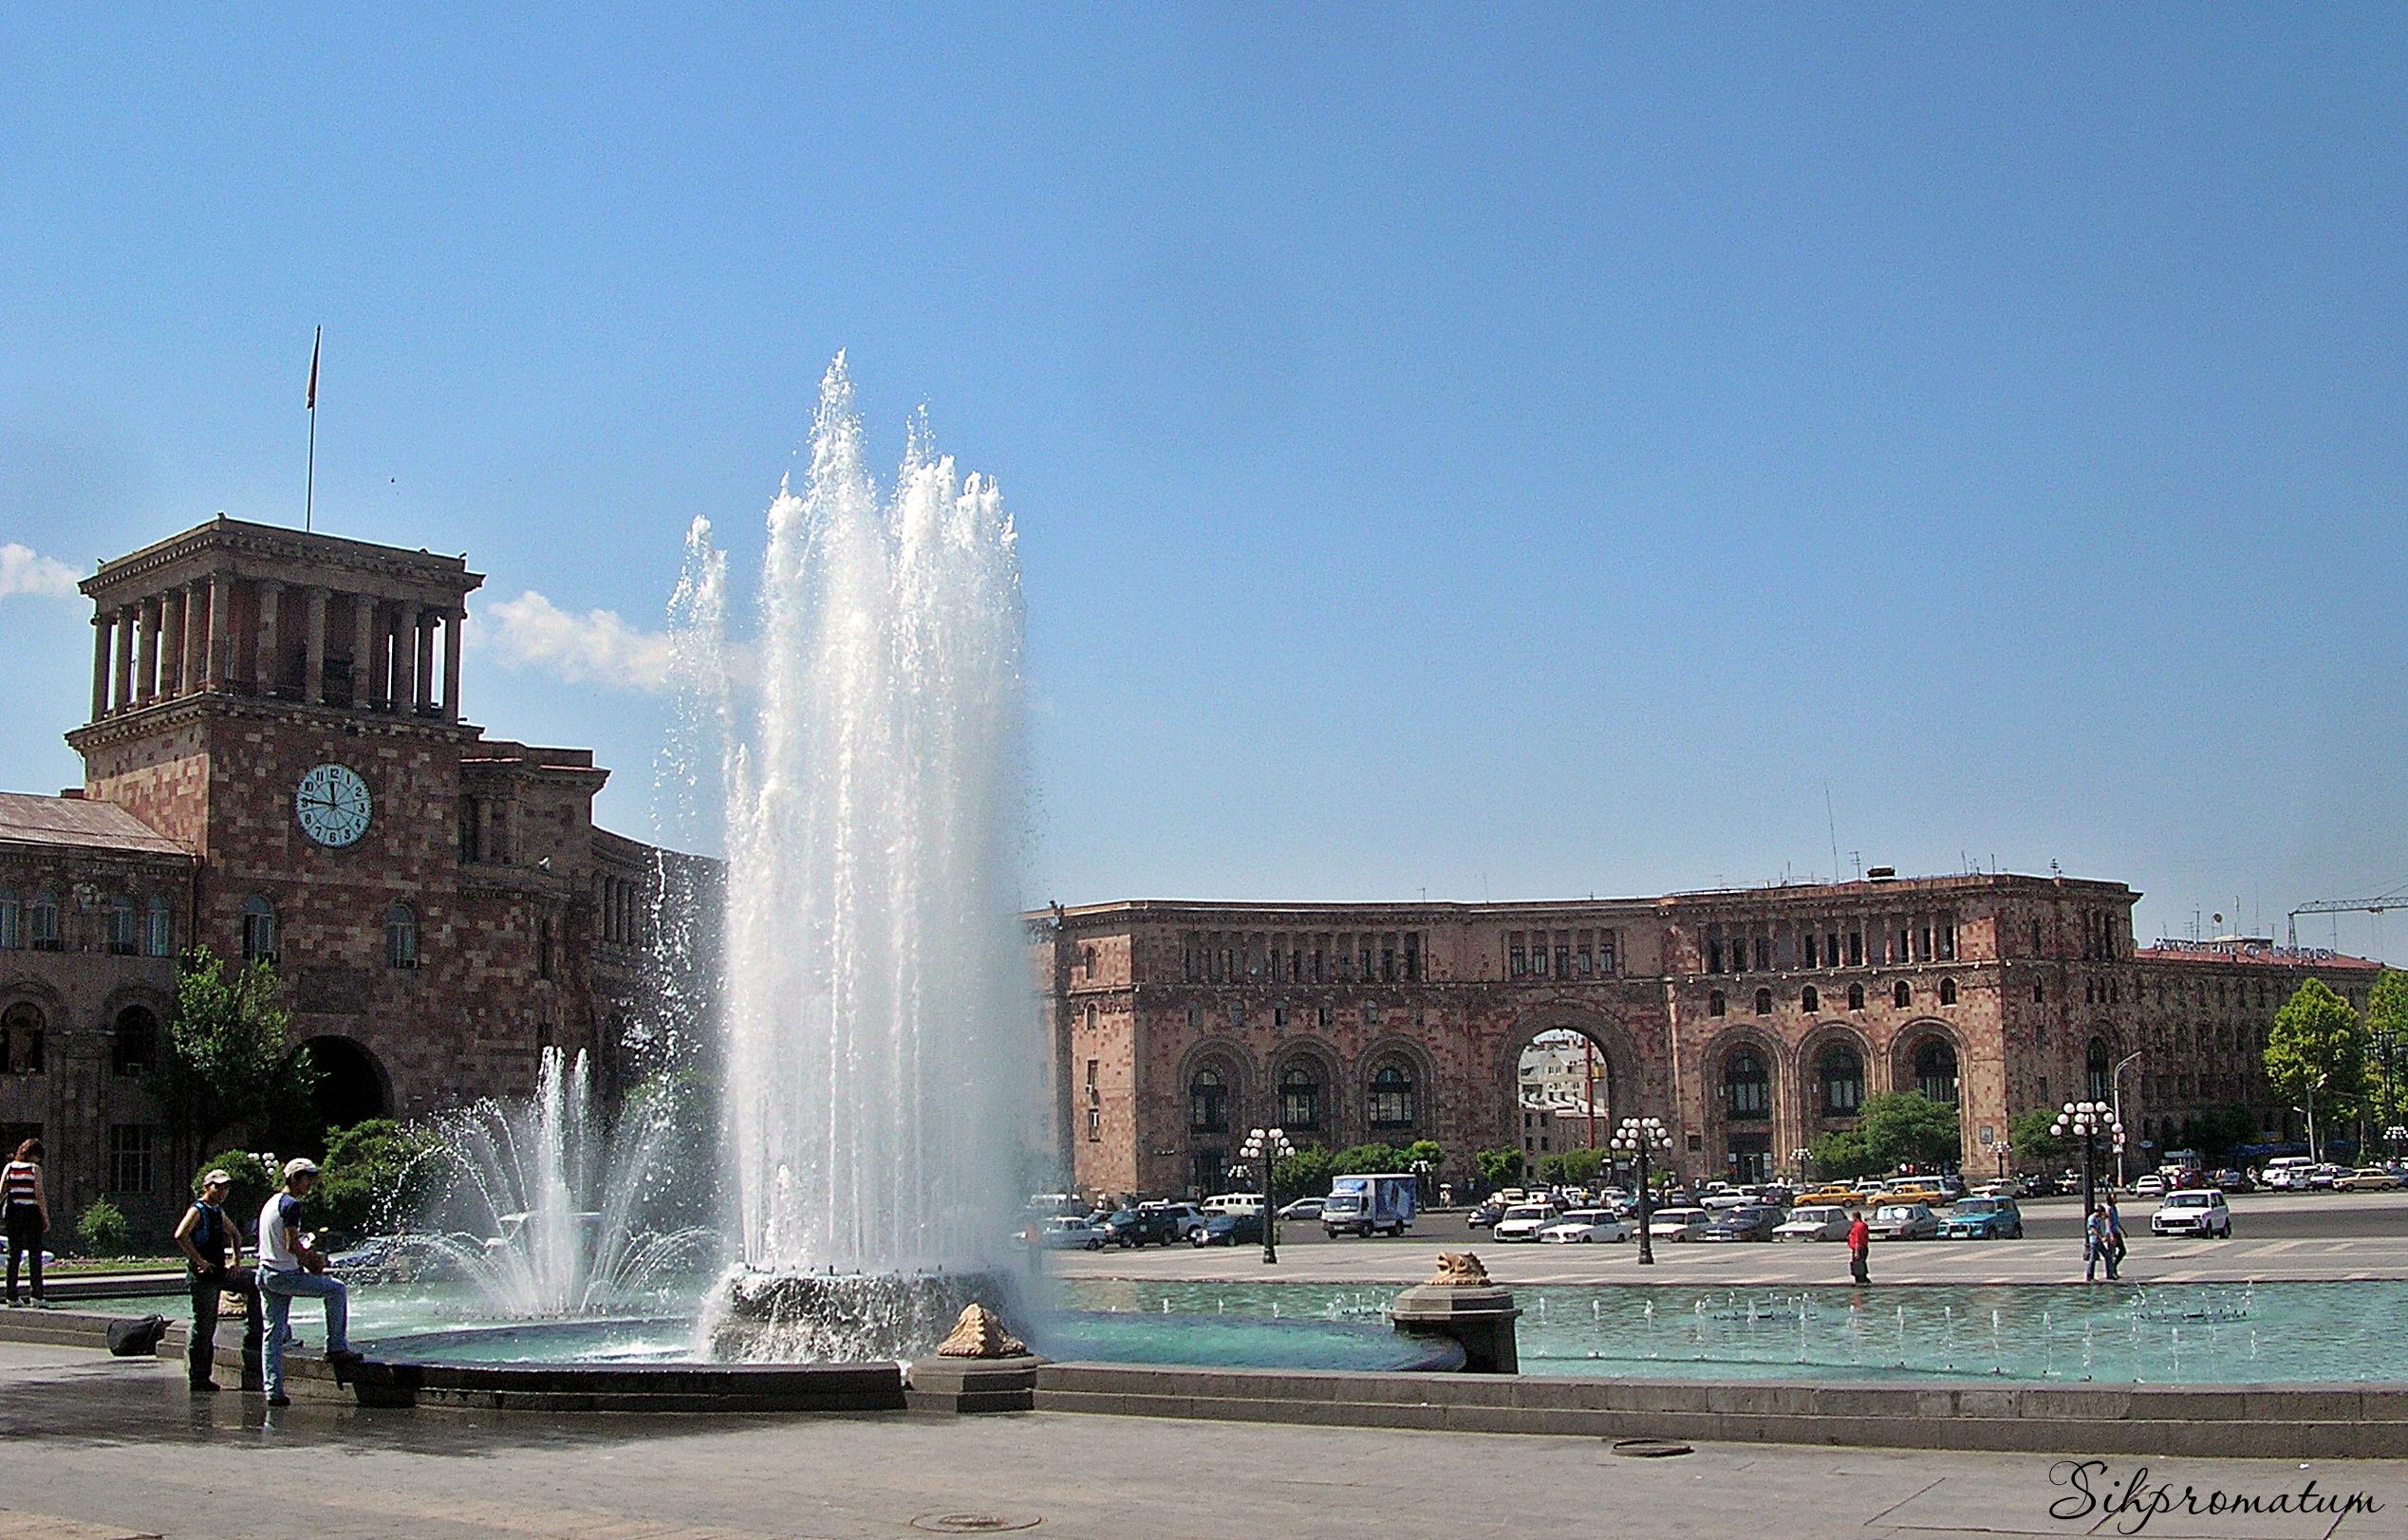 armenia photo essay